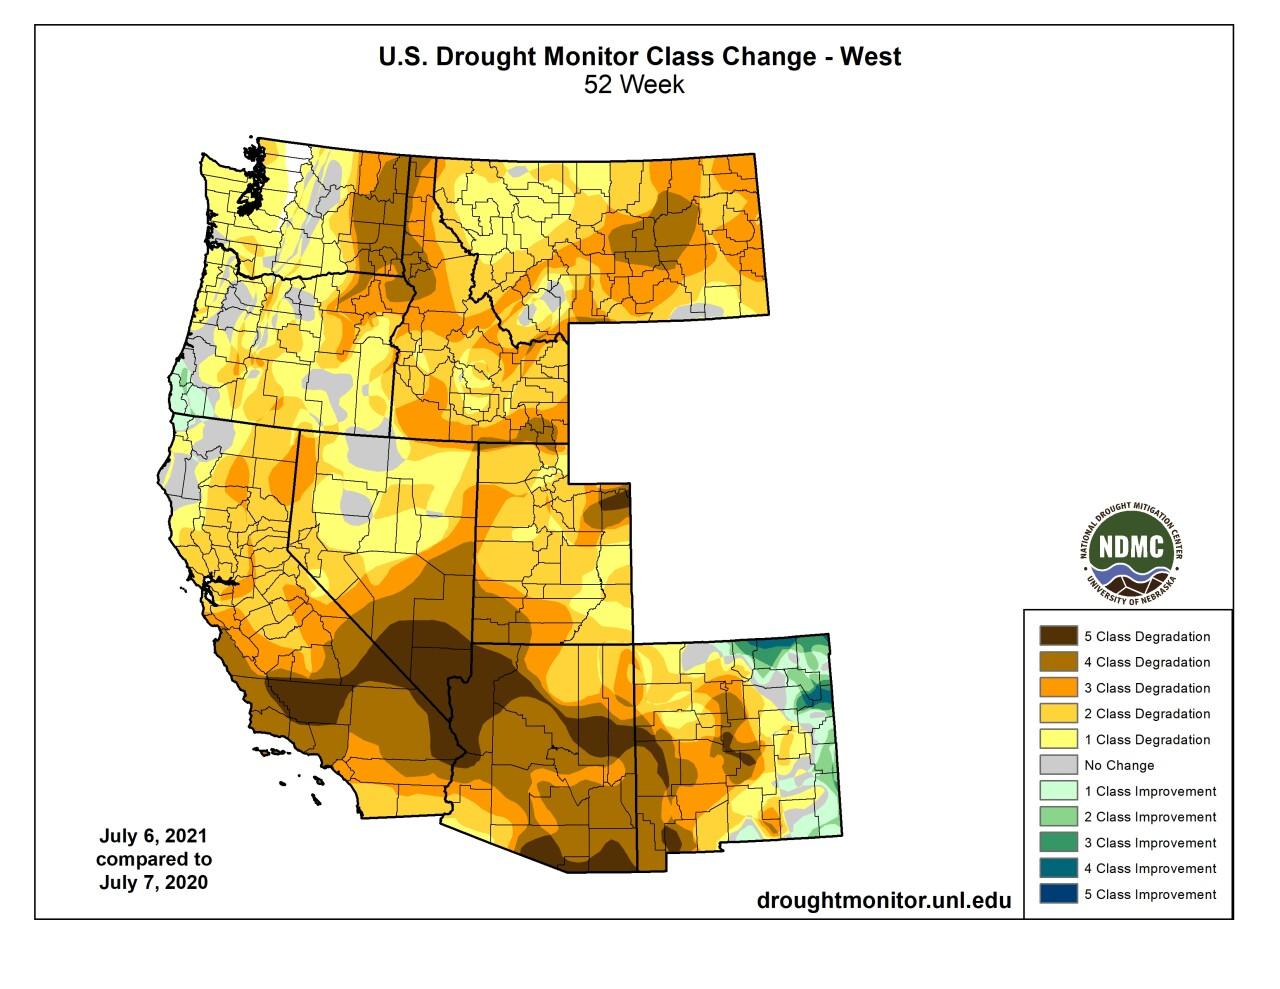 drought_west_change_52weeks.jpeg